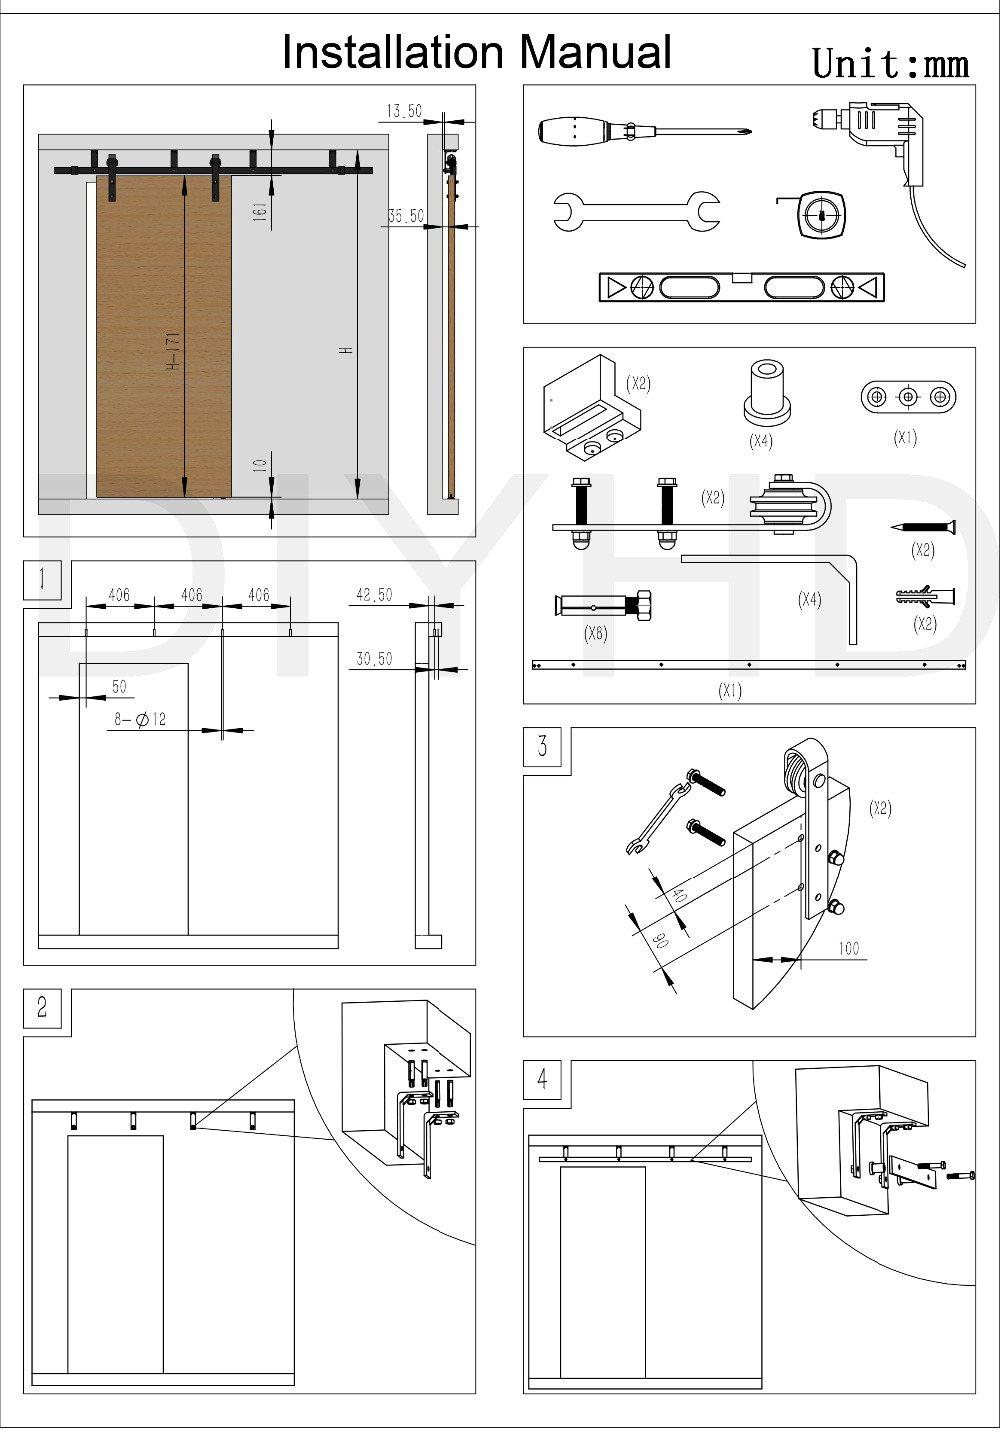 DIYHD 5ft 8ft Ceiling Mount Black Sliding Barn Door Hardware Rustic Bracket In Doors From Home Improvement On Aliexpress